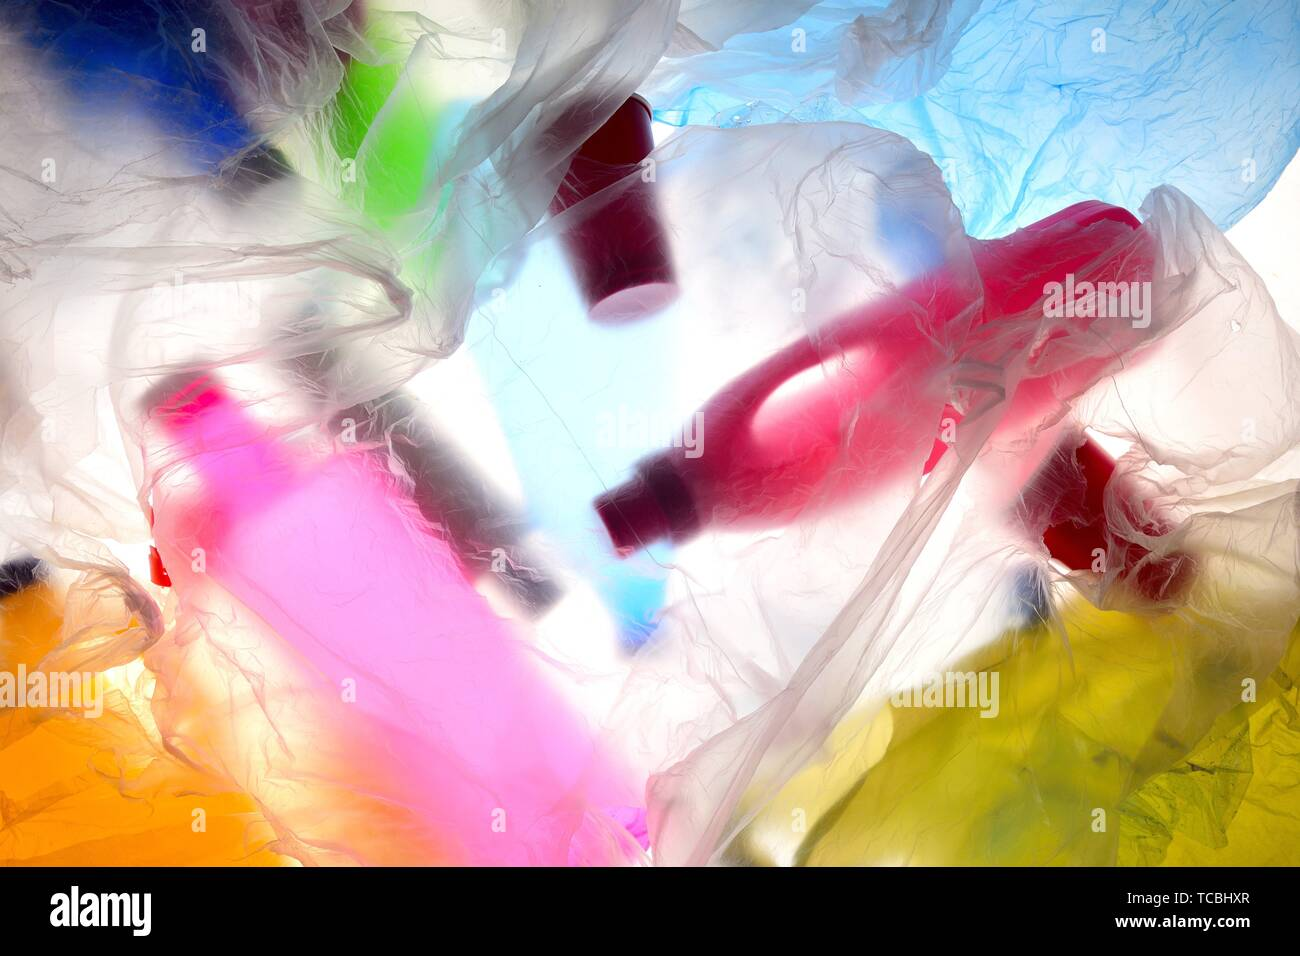 trash diffuse plastic backlight. - Stock Image